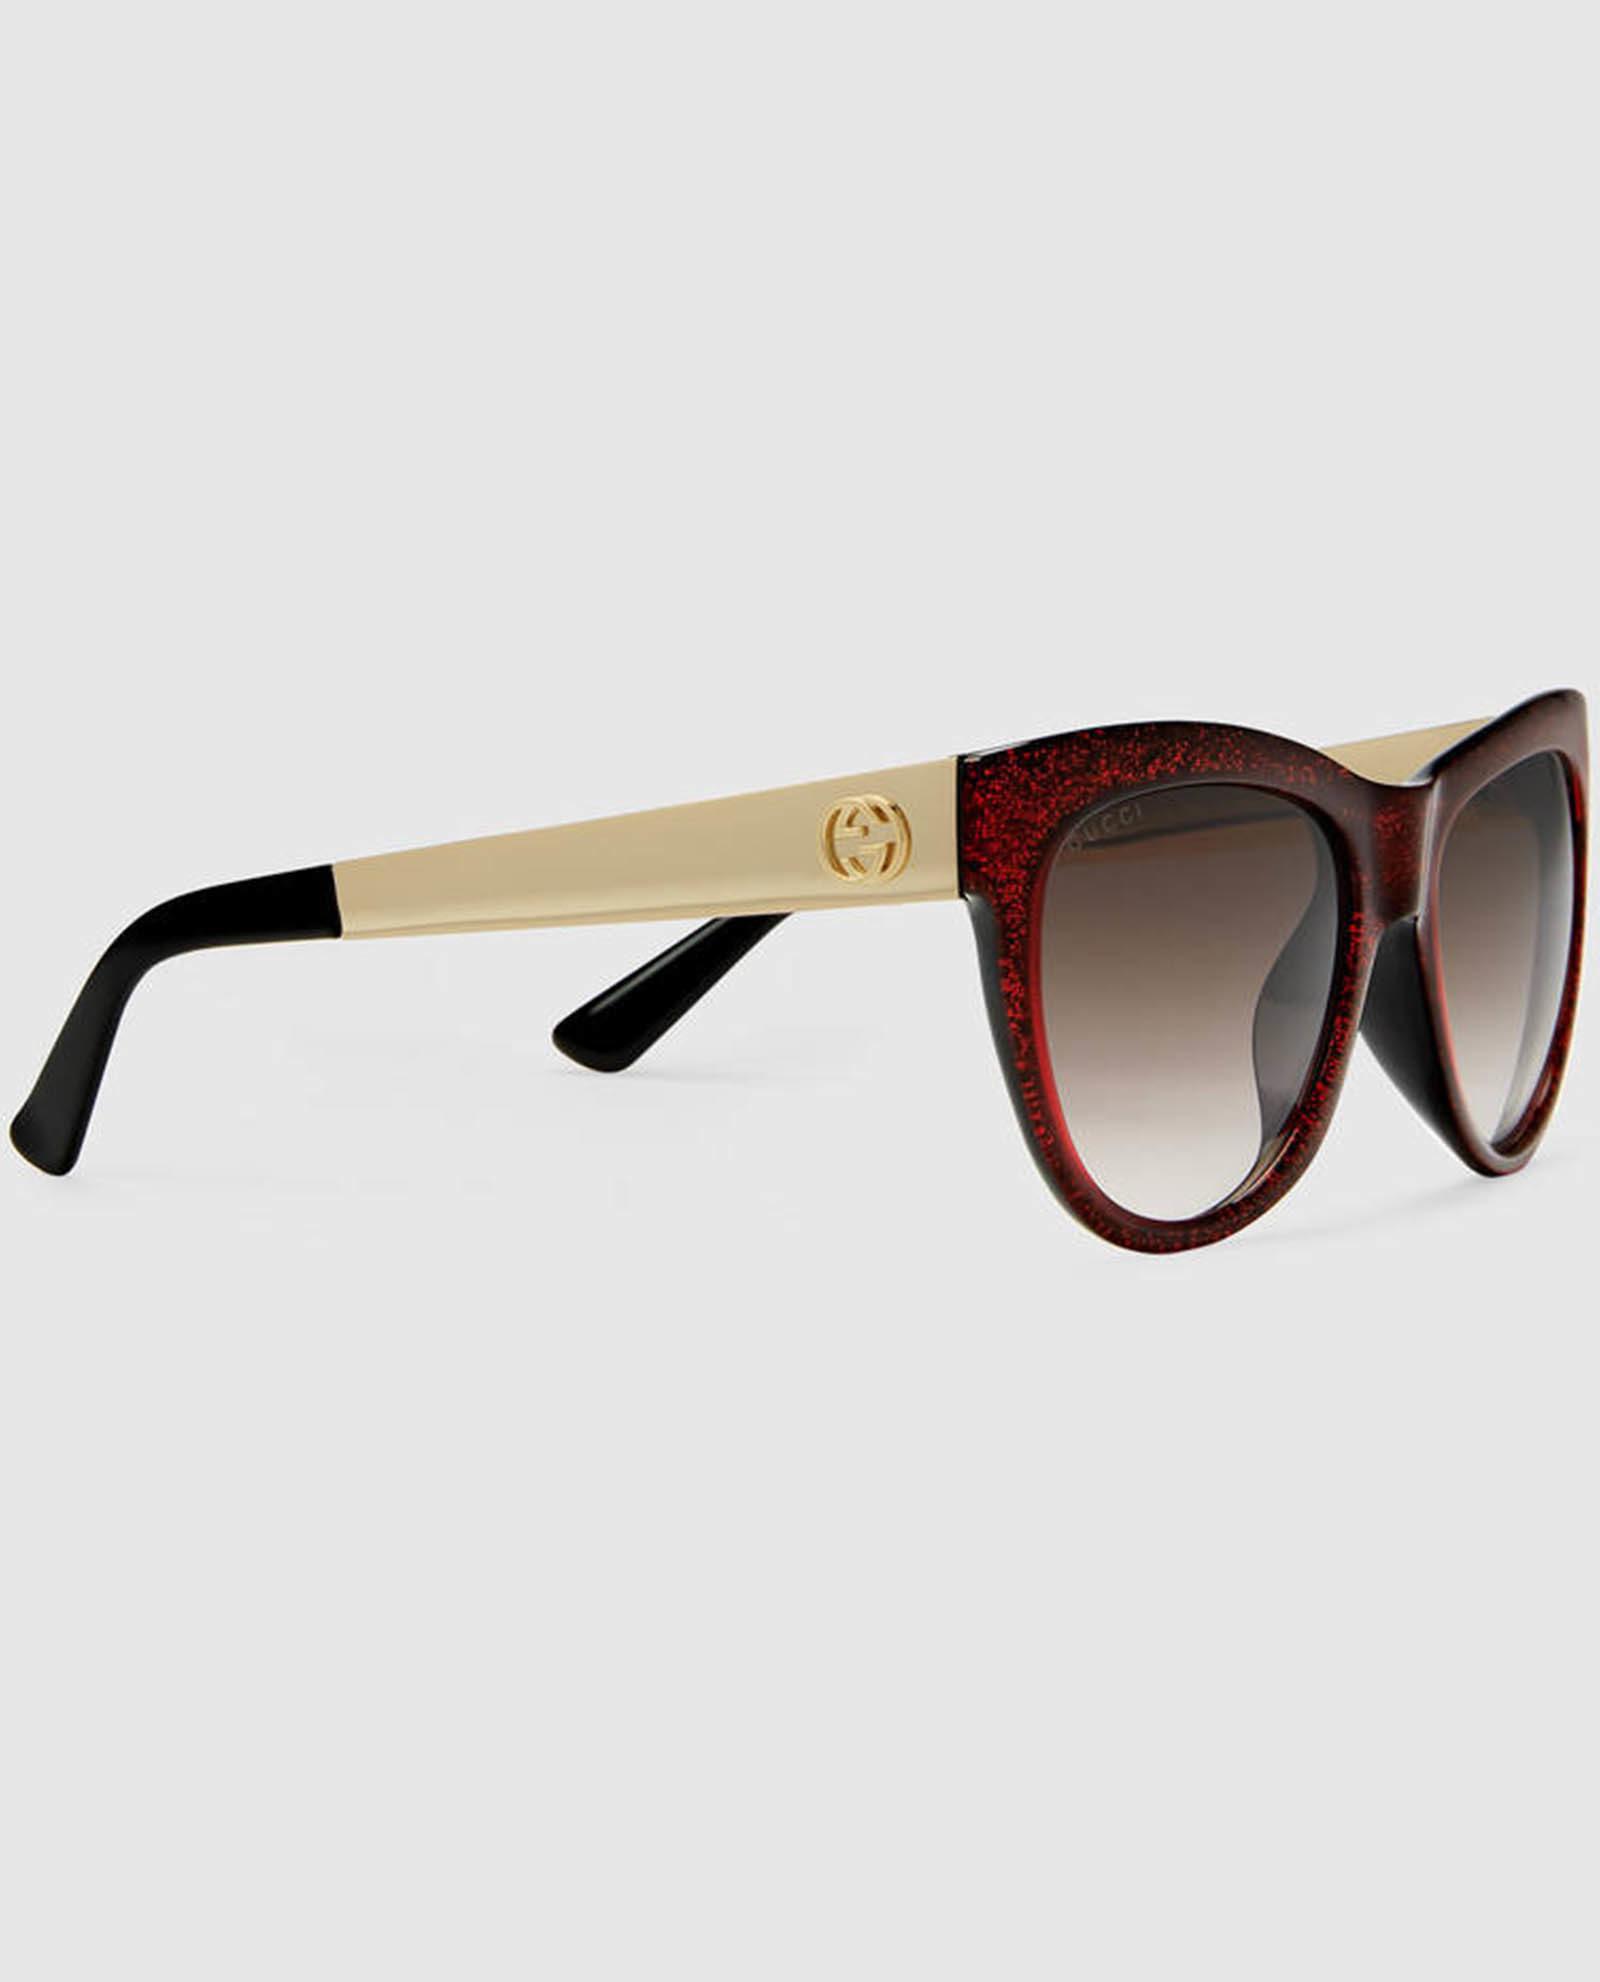 https://www.polydoruoptika.gr/wp-content/uploads/2018/03/434045_J1350_1819_002_100_0000_Light-Cat-eye-glitter-sunglasses-GUCCI-WOMAN.jpg